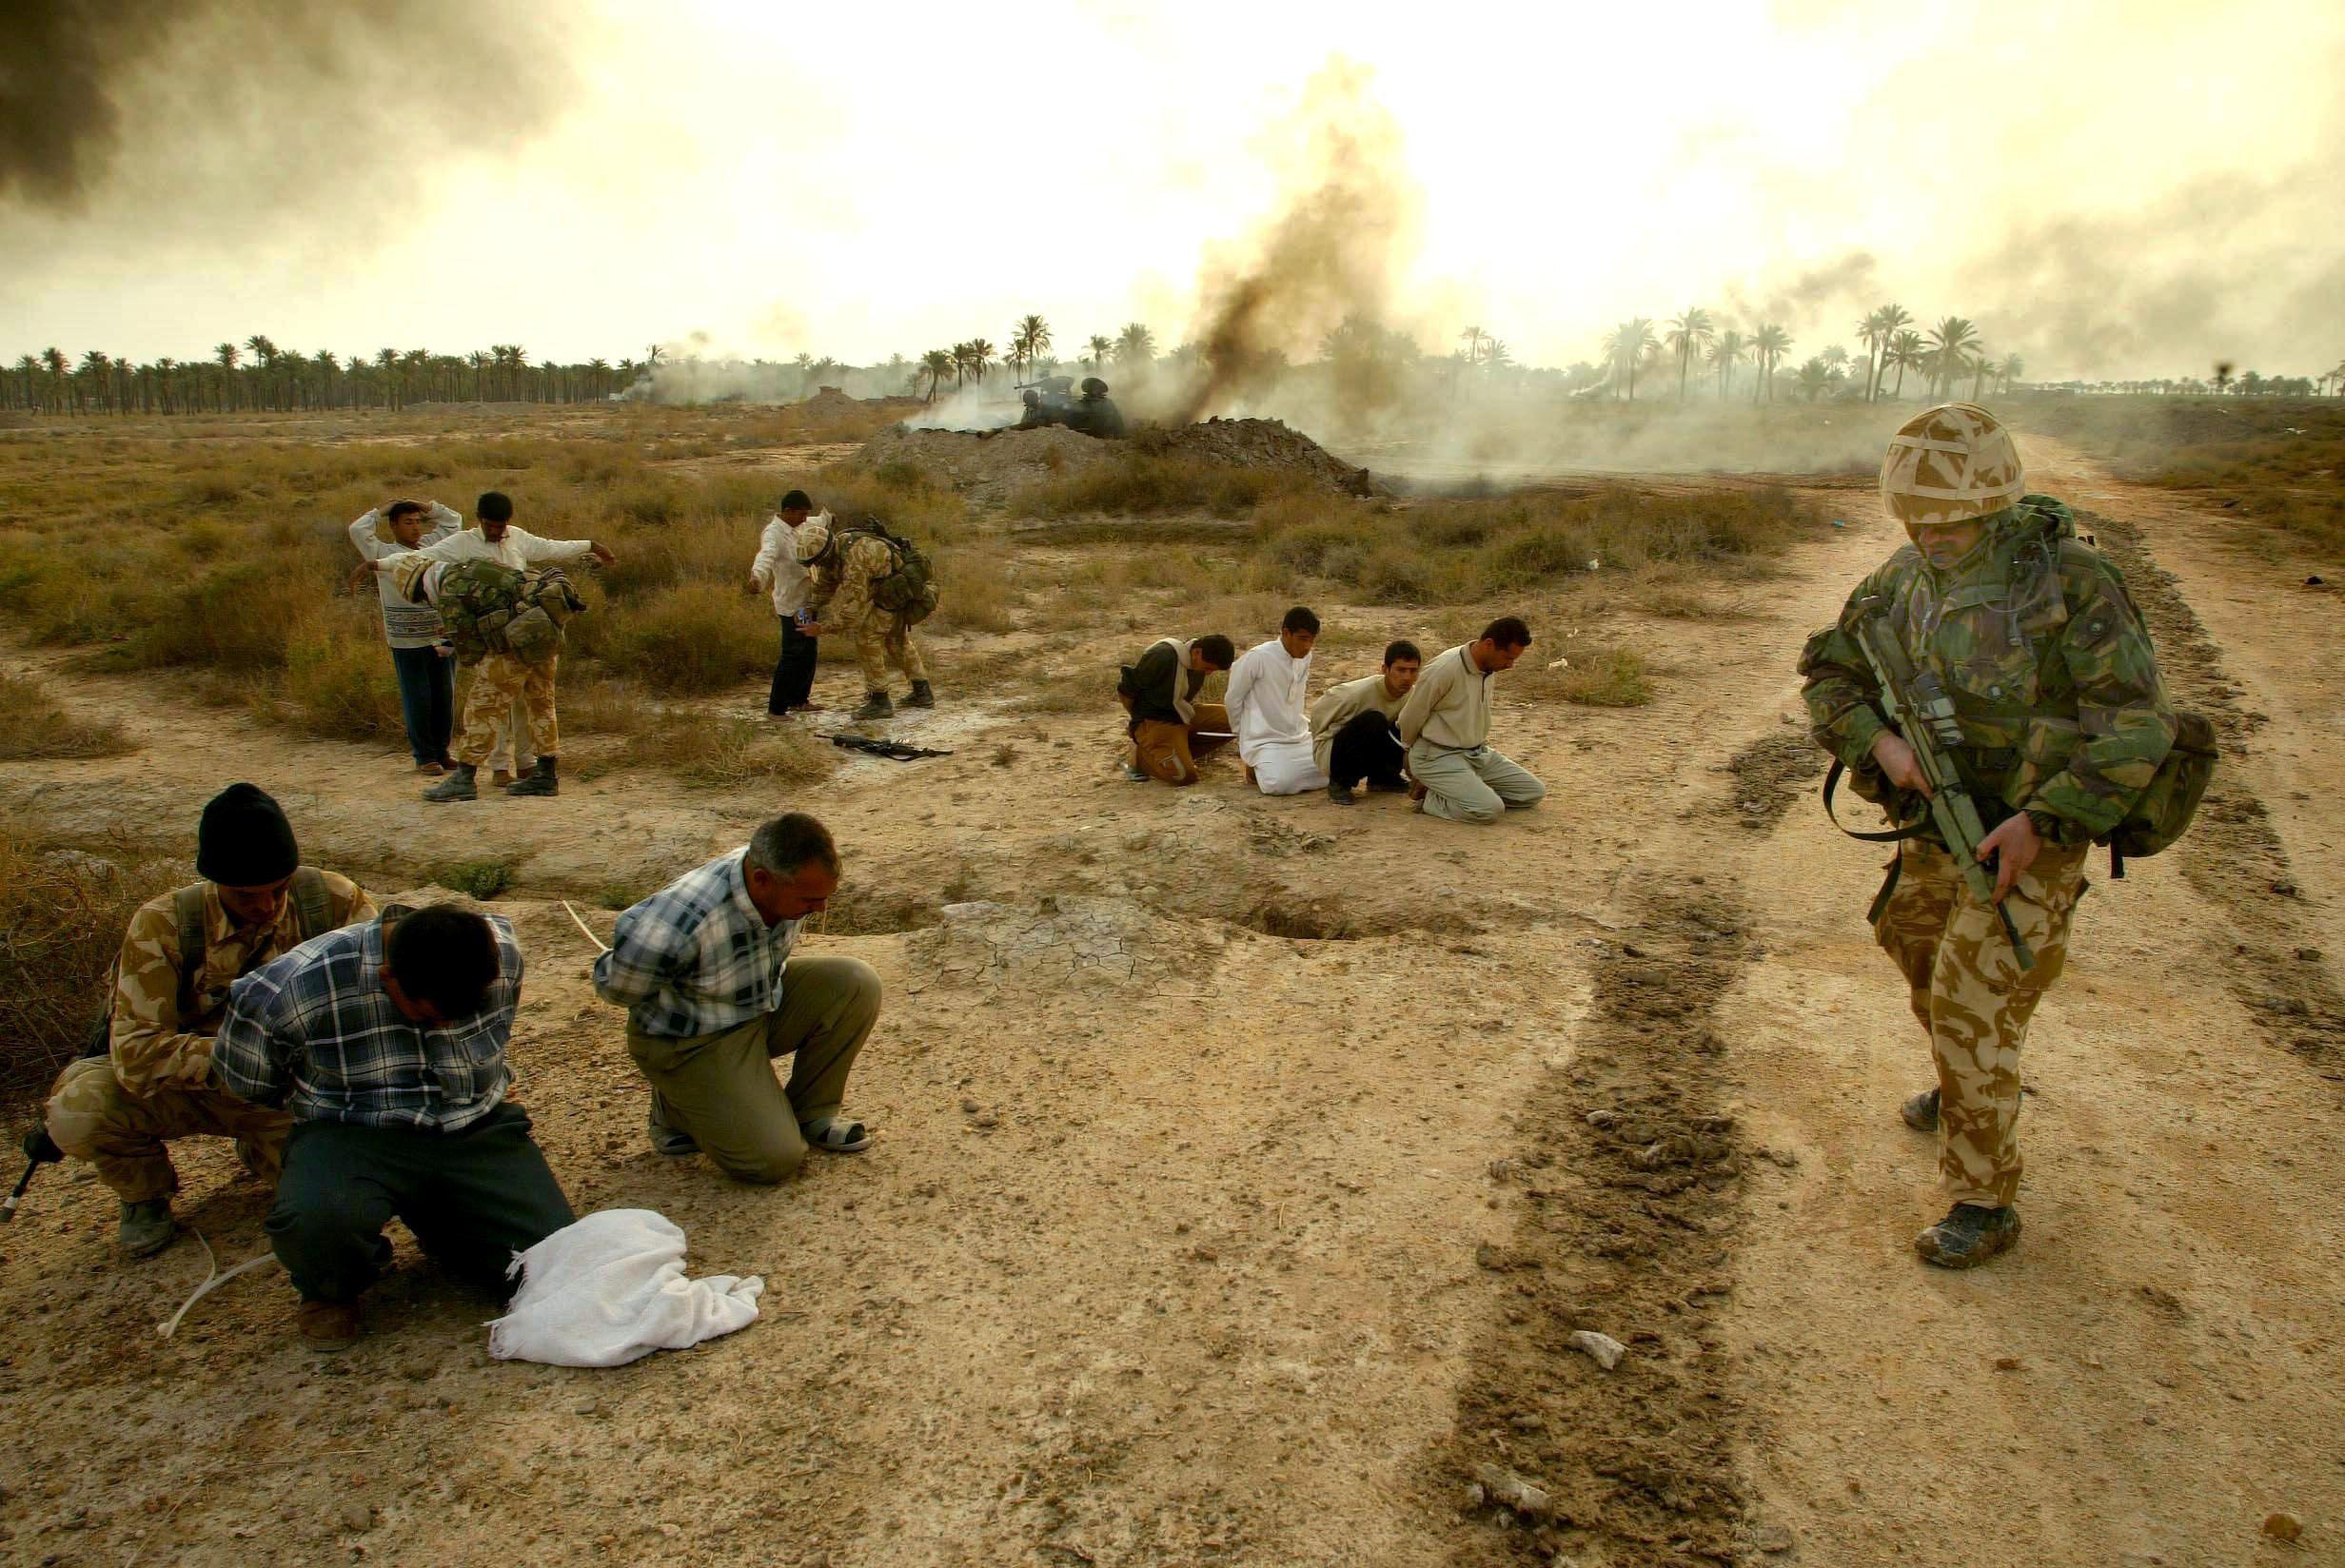 http://s.newsweek.com/sites/www.newsweek.com/files/styles/feature/public/2014/12/16/iraqi-militia-surrender-royal-marines.jpg